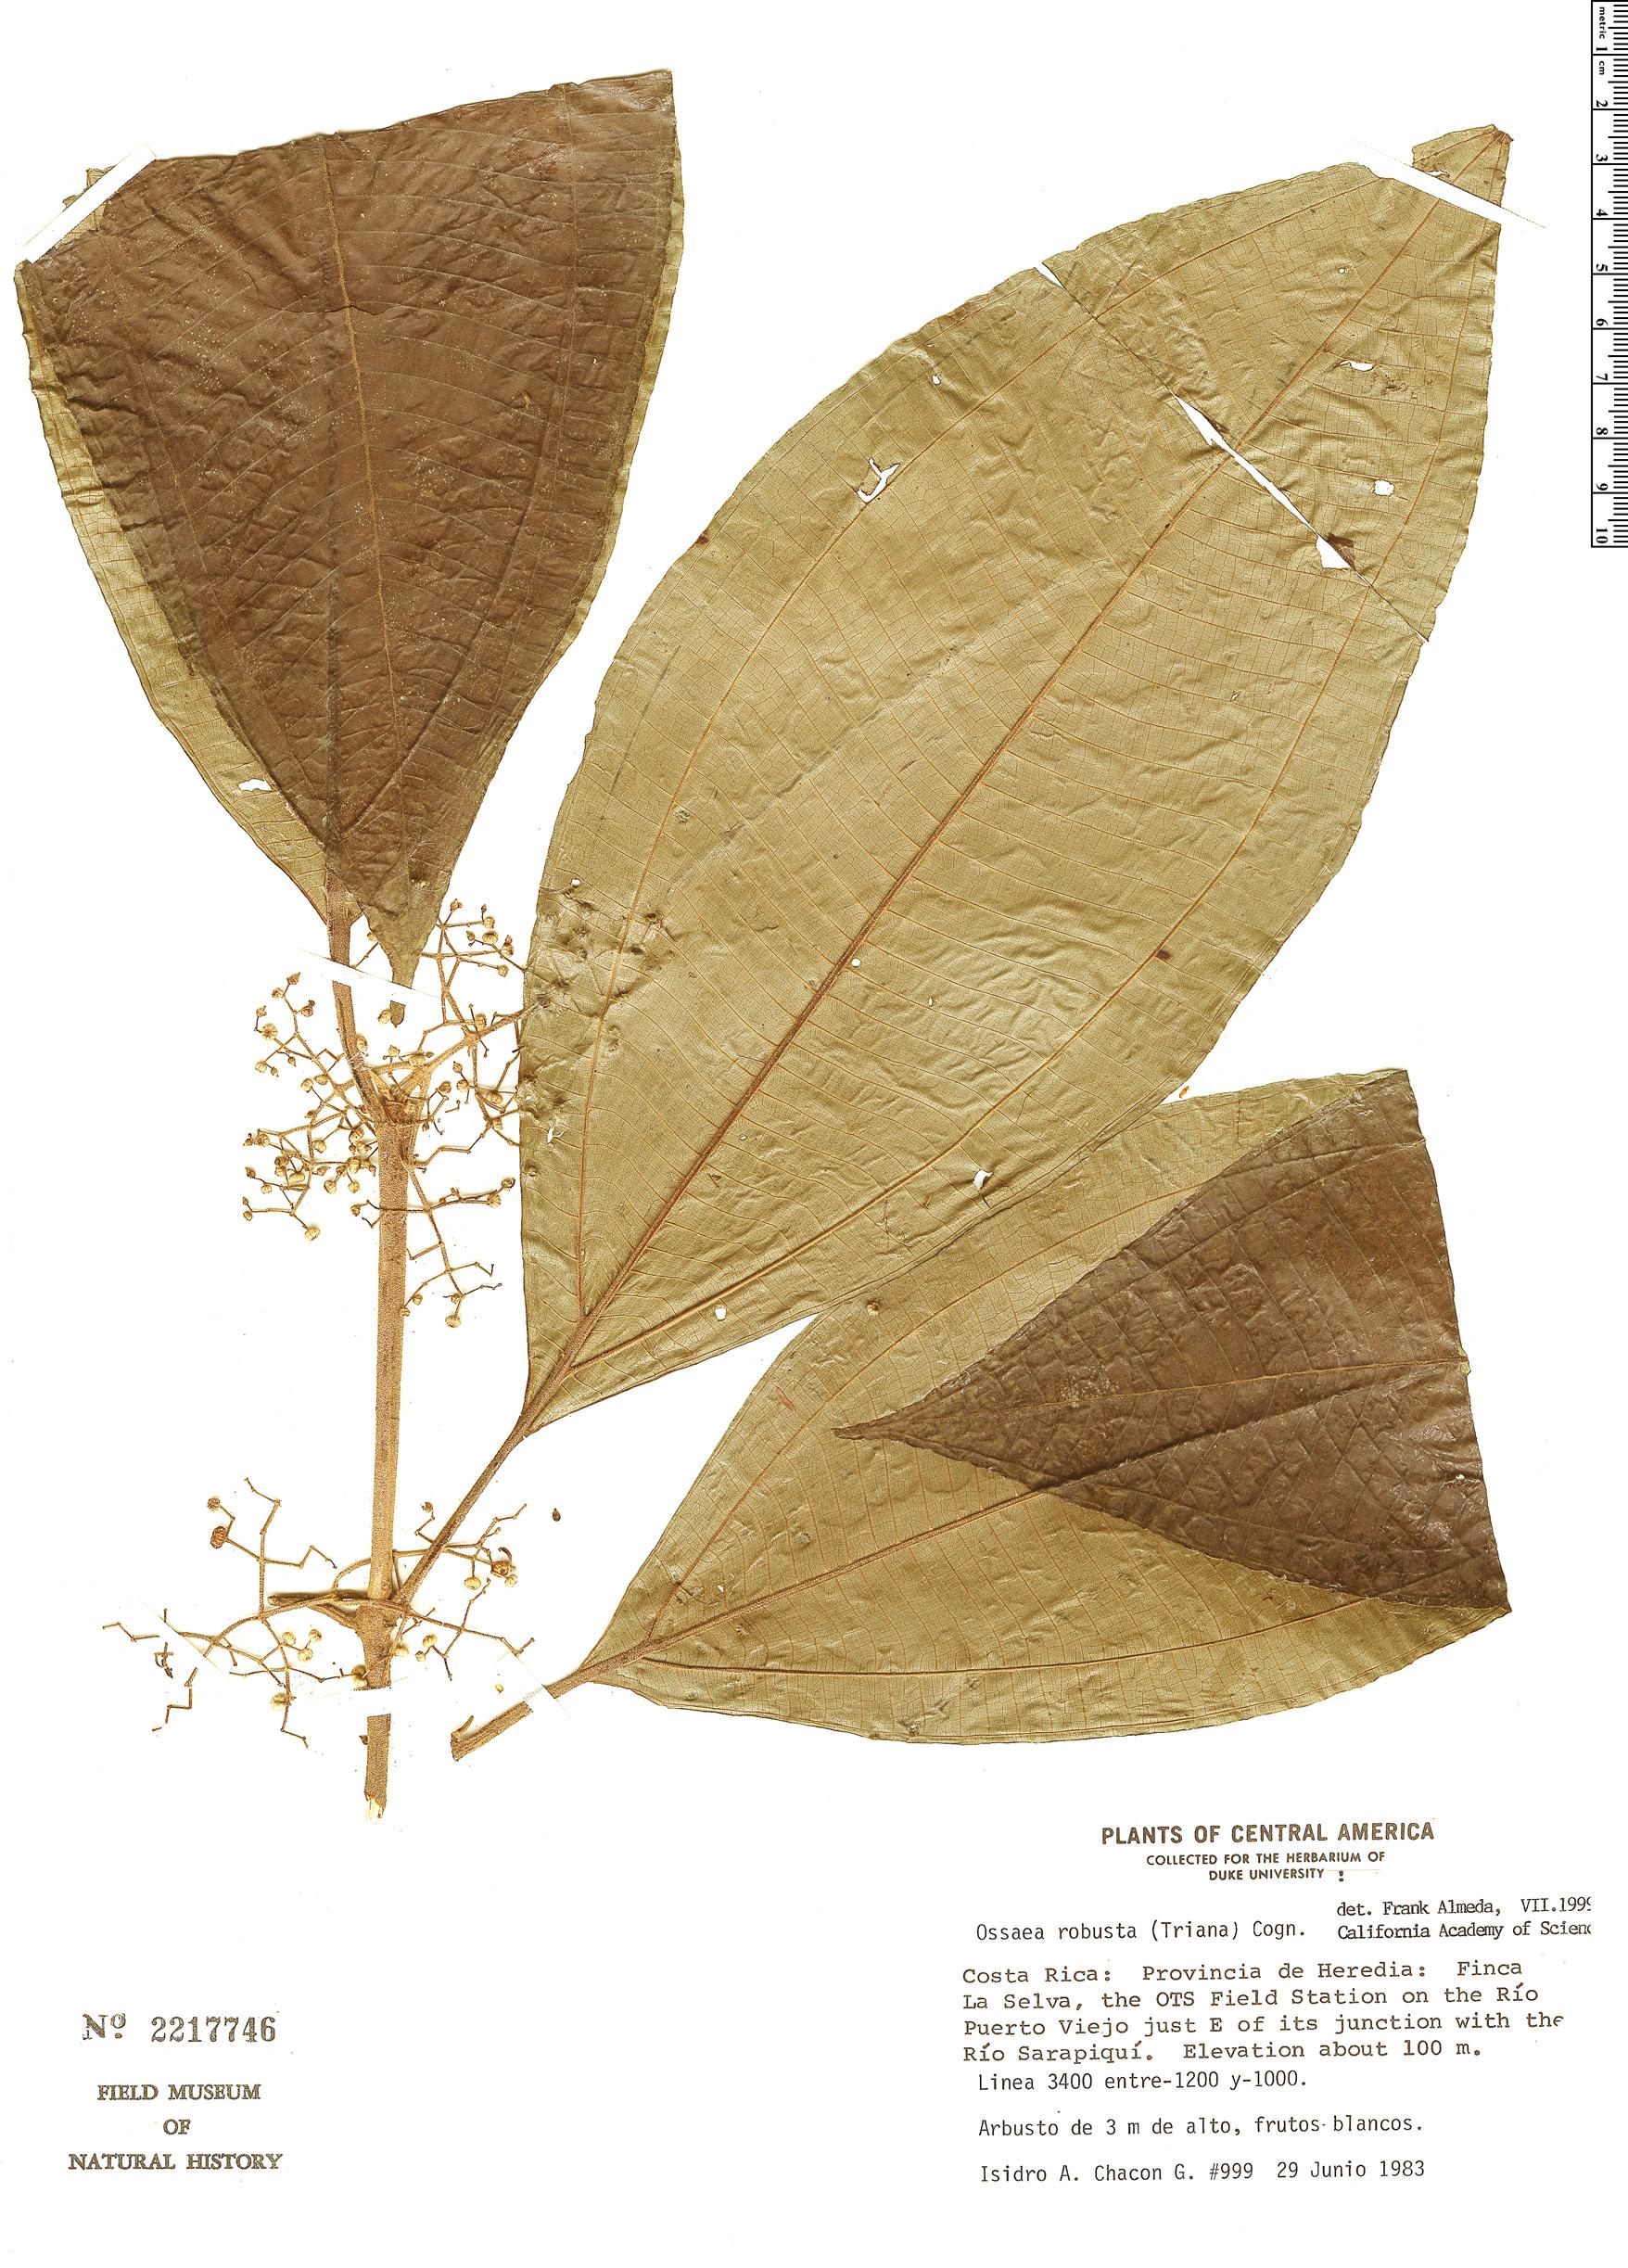 Specimen: Ossaea robusta